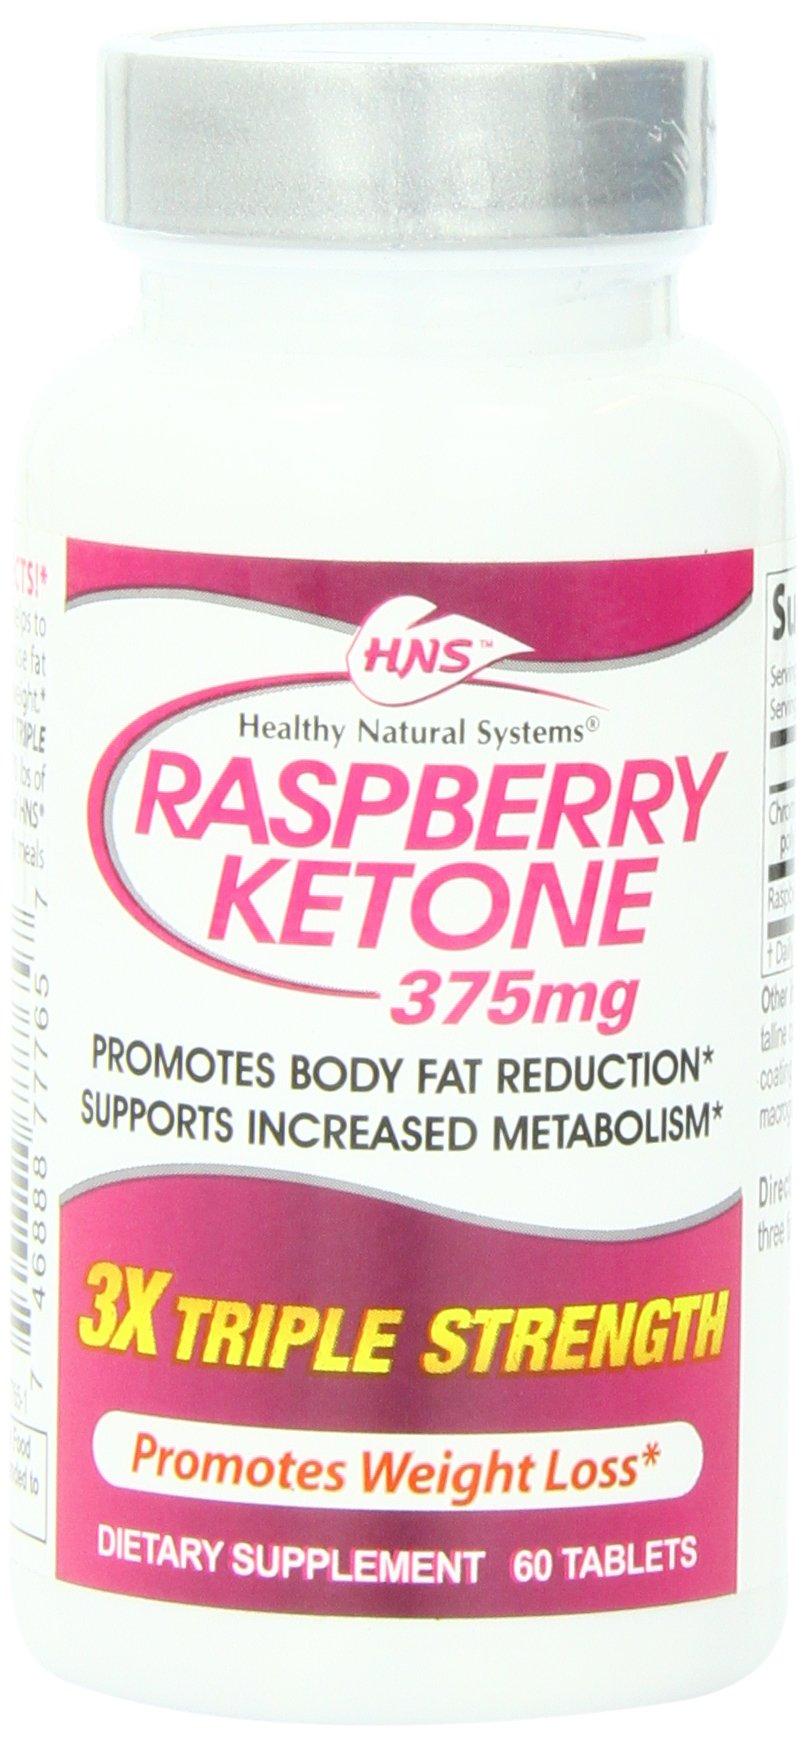 Healthy Natural Systems Raspberry Ketone 3X Triple Strength by Healthy Natural Systems